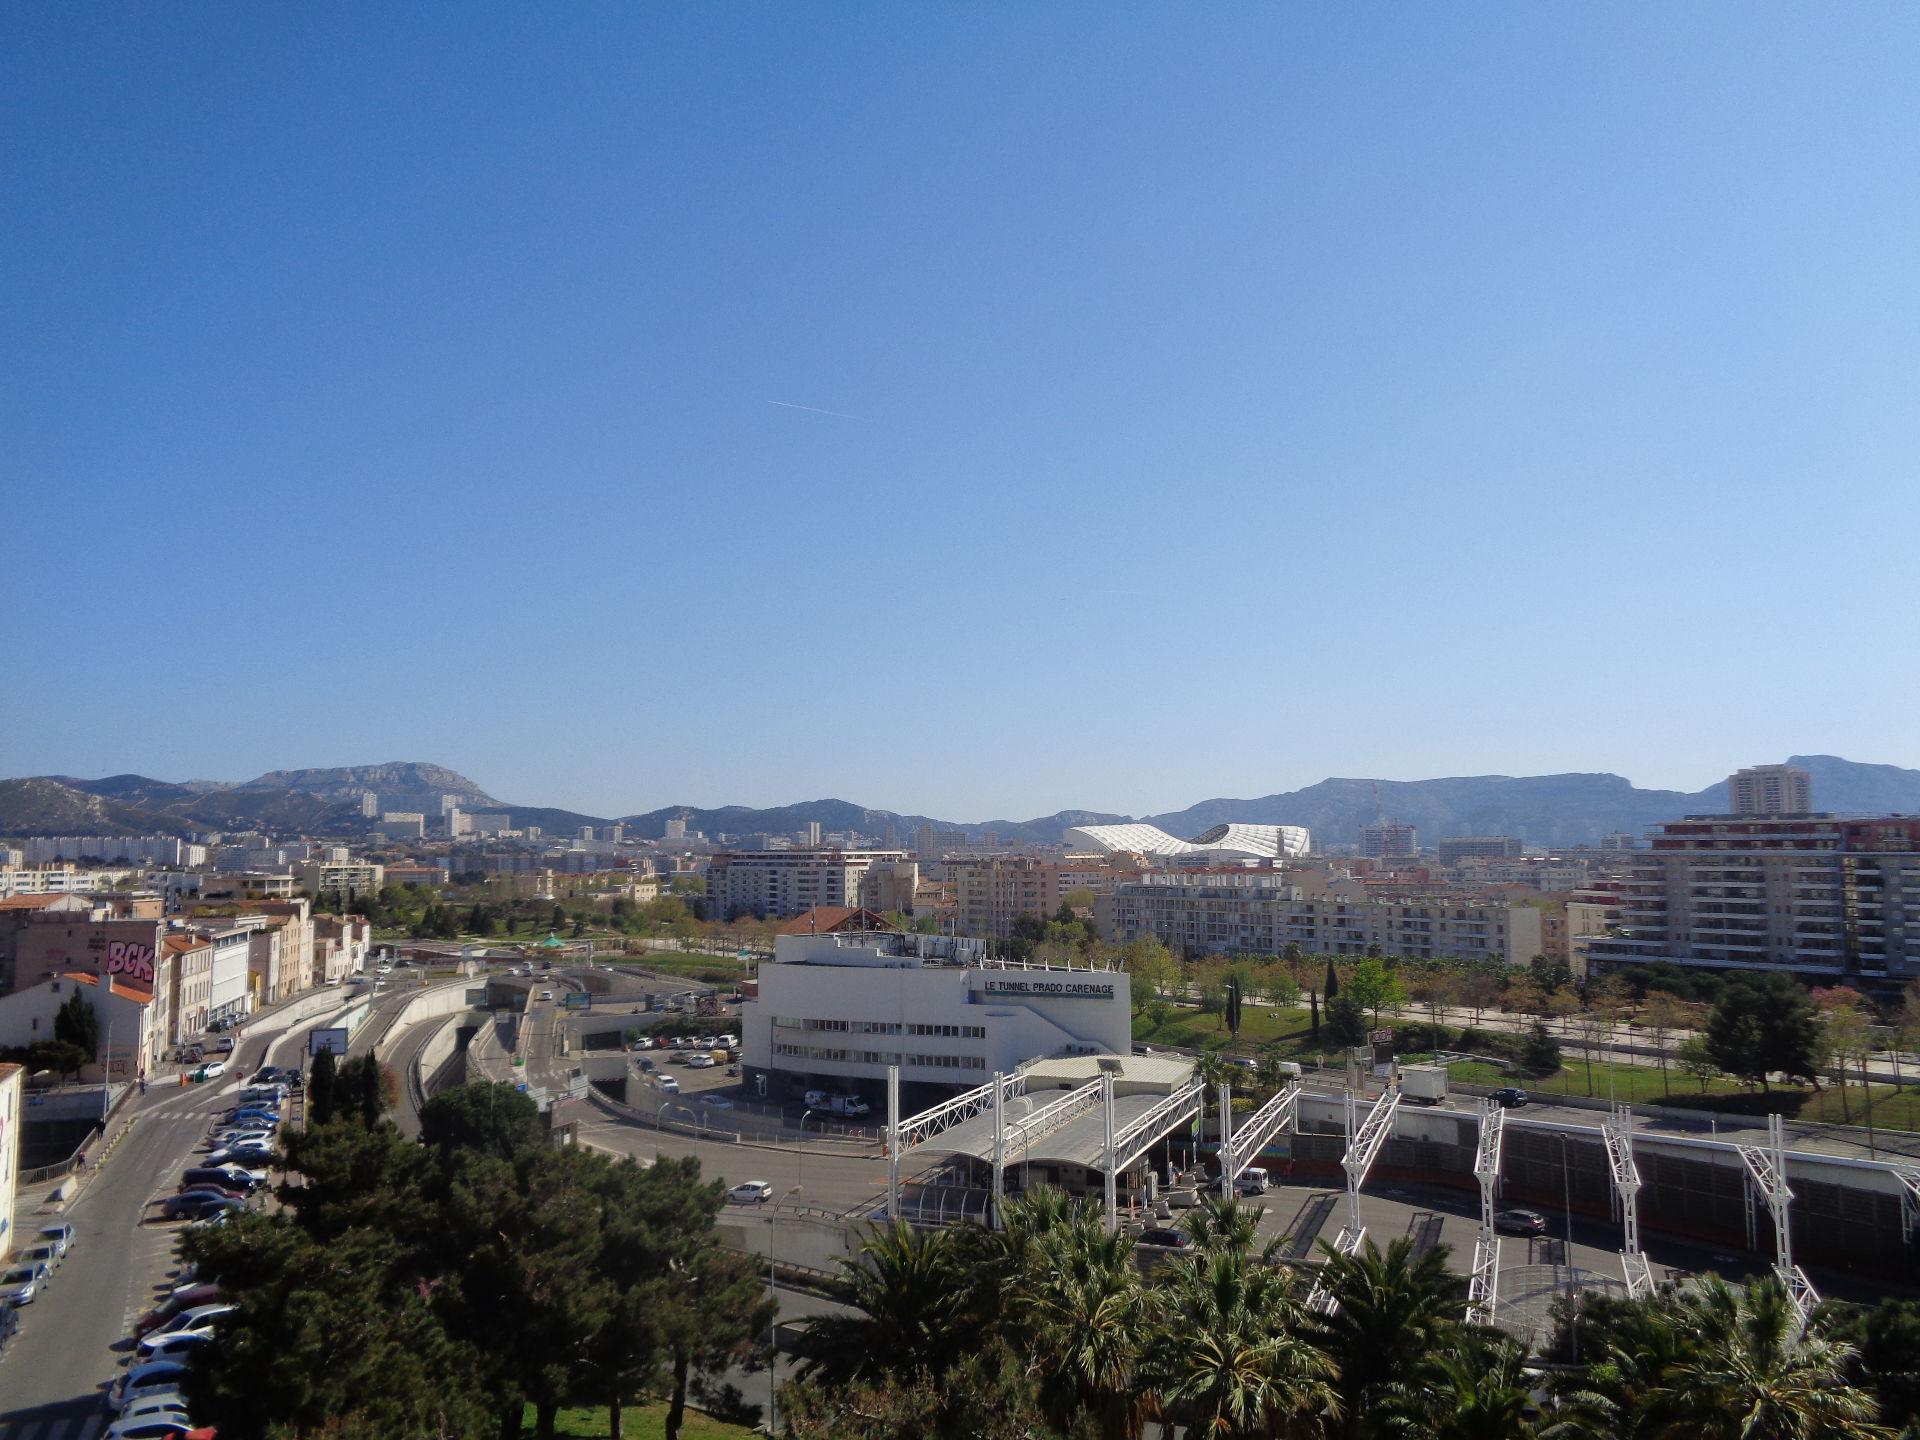 Annonce vente appartement marseille 10 80 m 195 300 for Marseille appartement